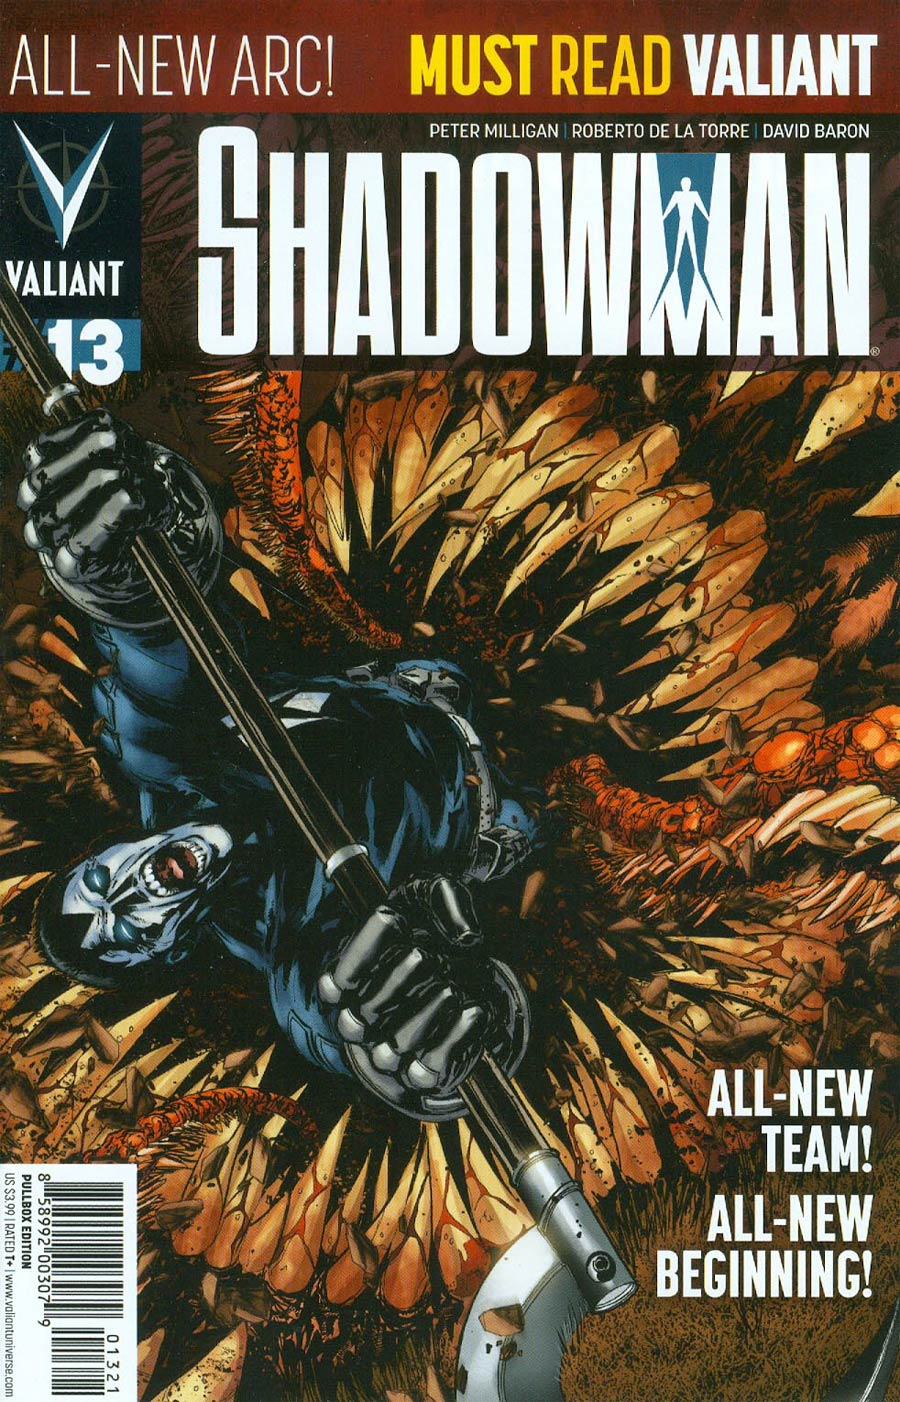 Shadowman Vol 4 #13 Cover B Variant Miguel Sepulveda Pullbox Cover